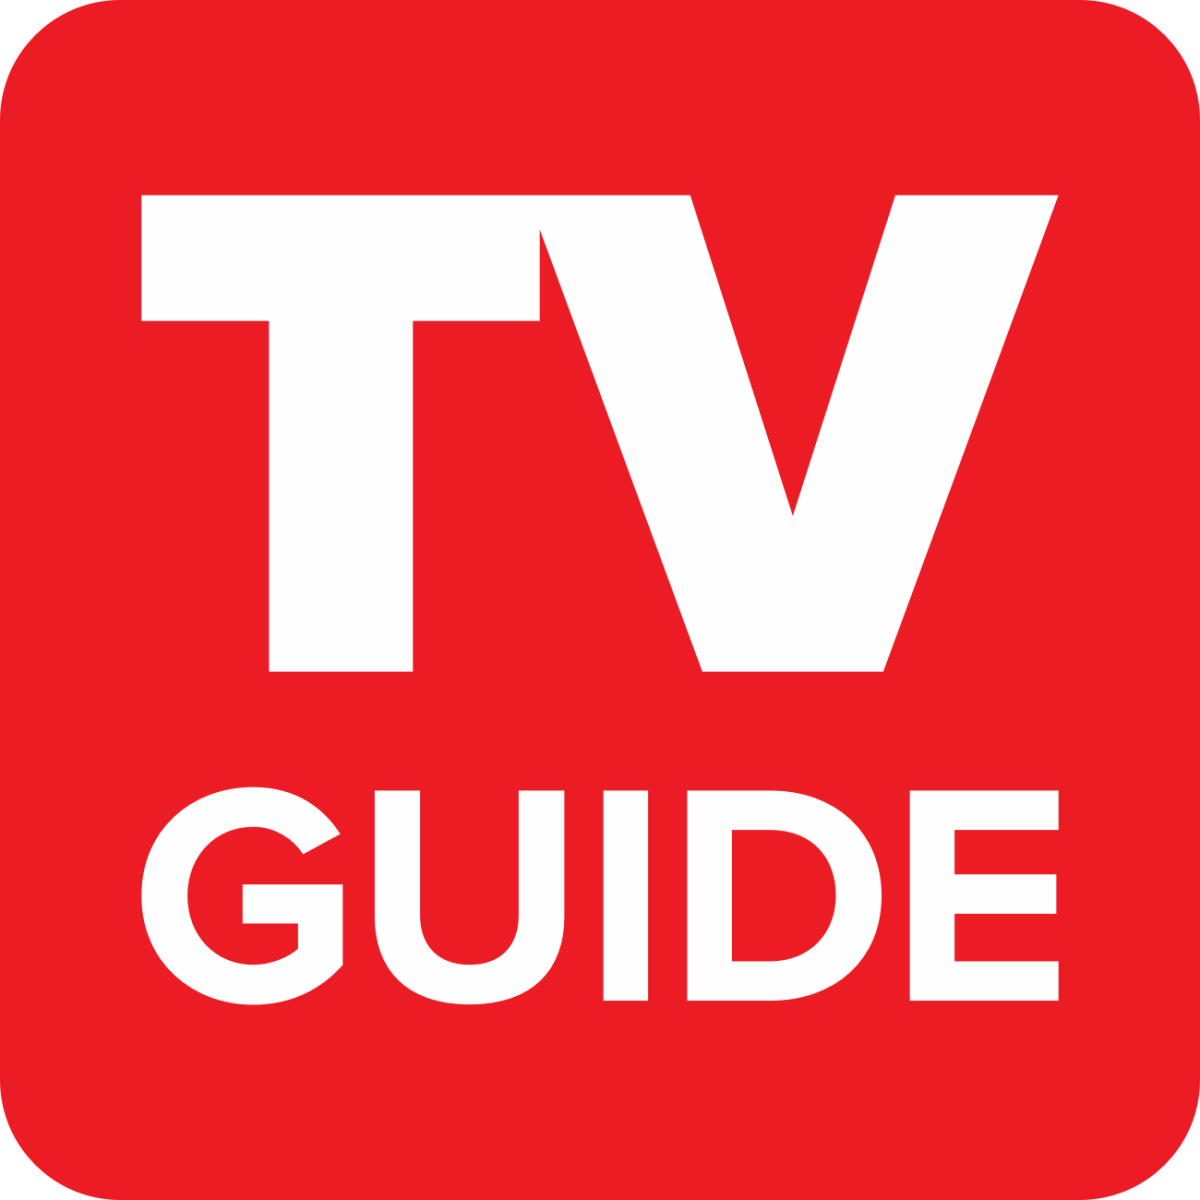 In 1953, TV Guide magazine began publishing.